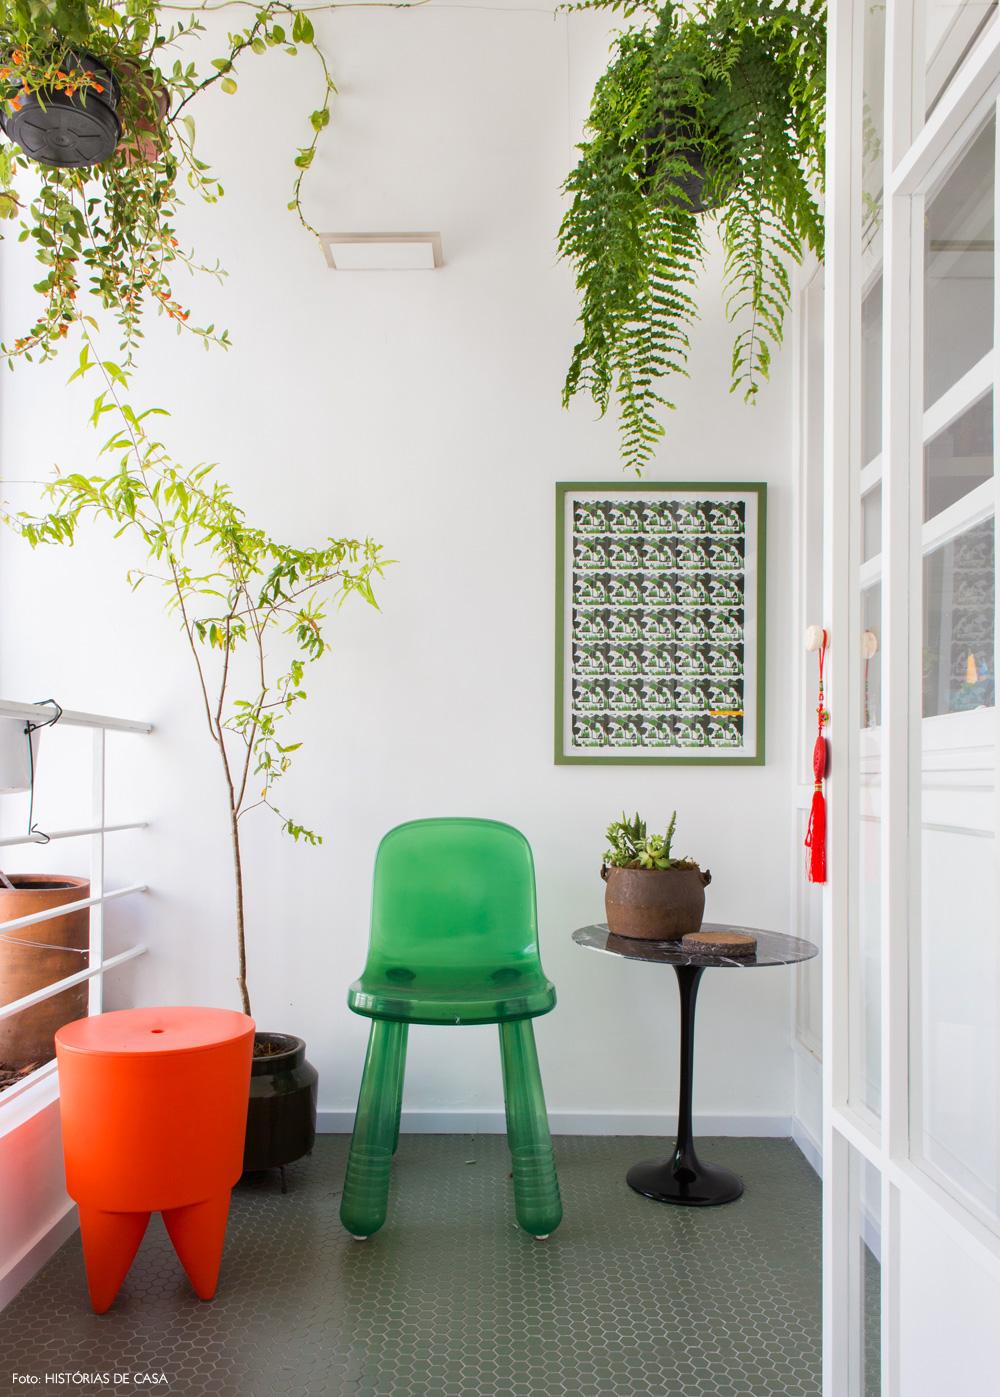 25-decoracao-varanda-pequena-plantas-penduradas-cores